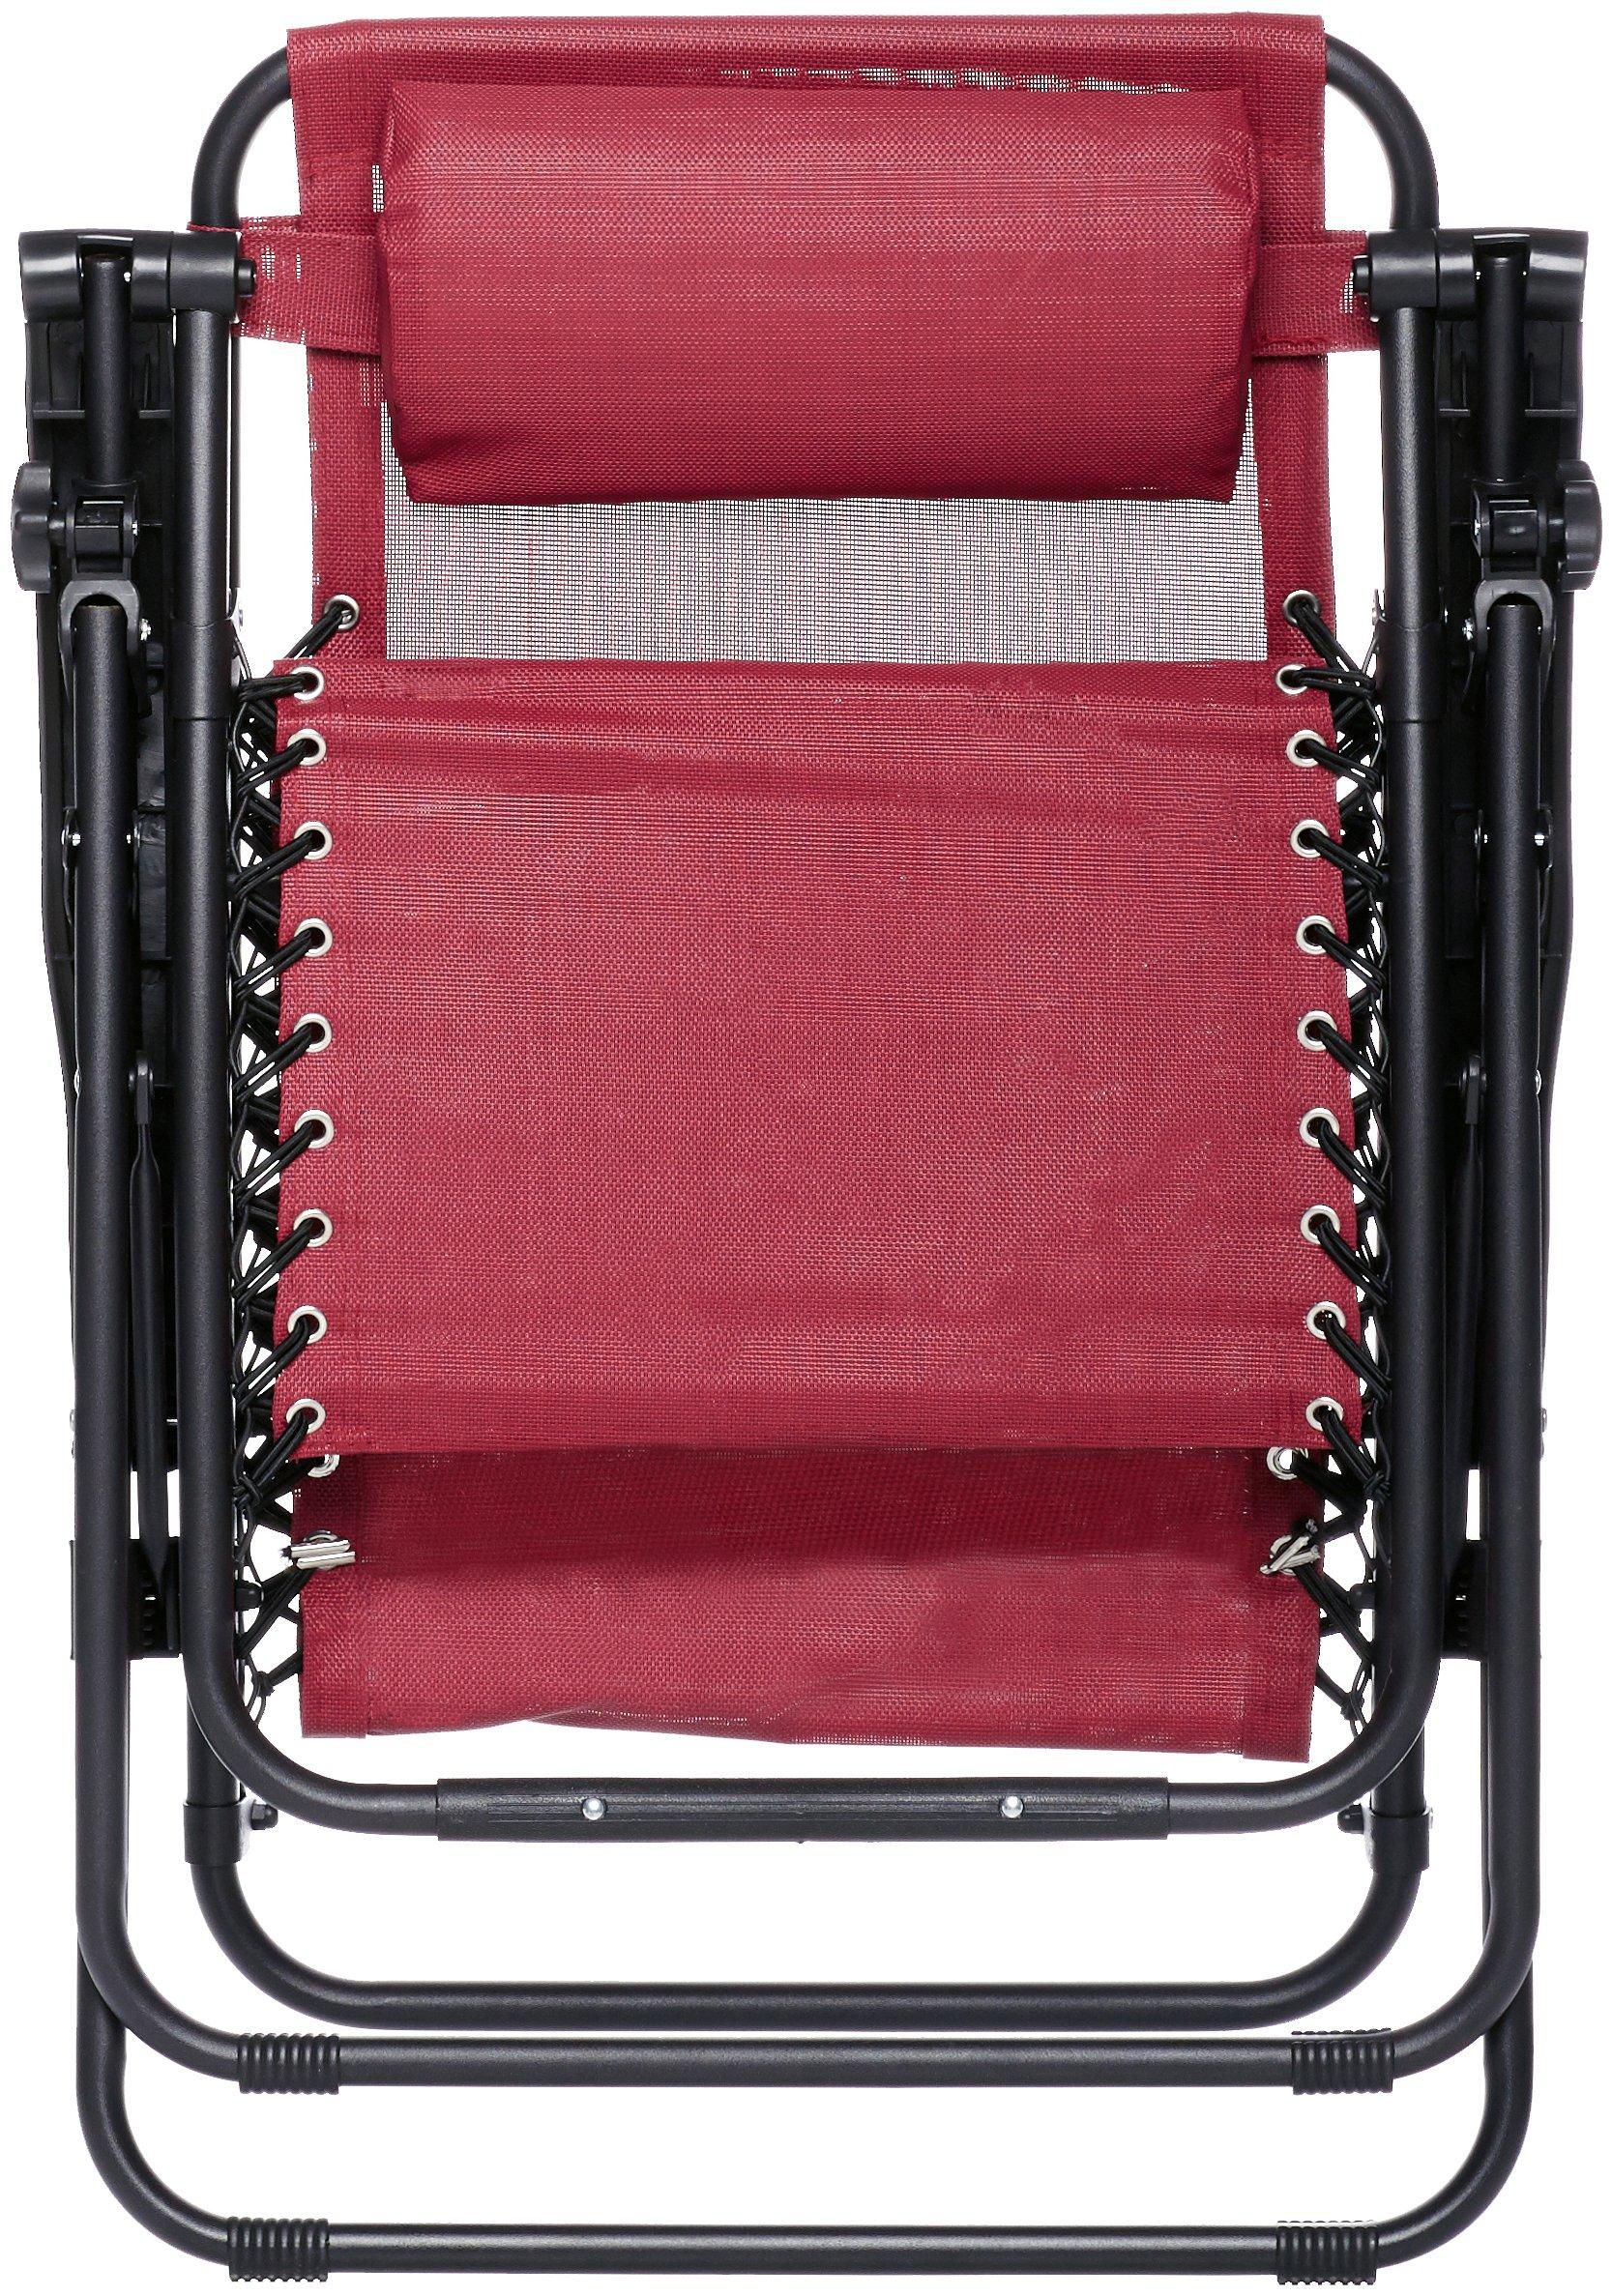 CDM product AmazonBasics Zero Gravity Chair - Burgundy small thumbnail image